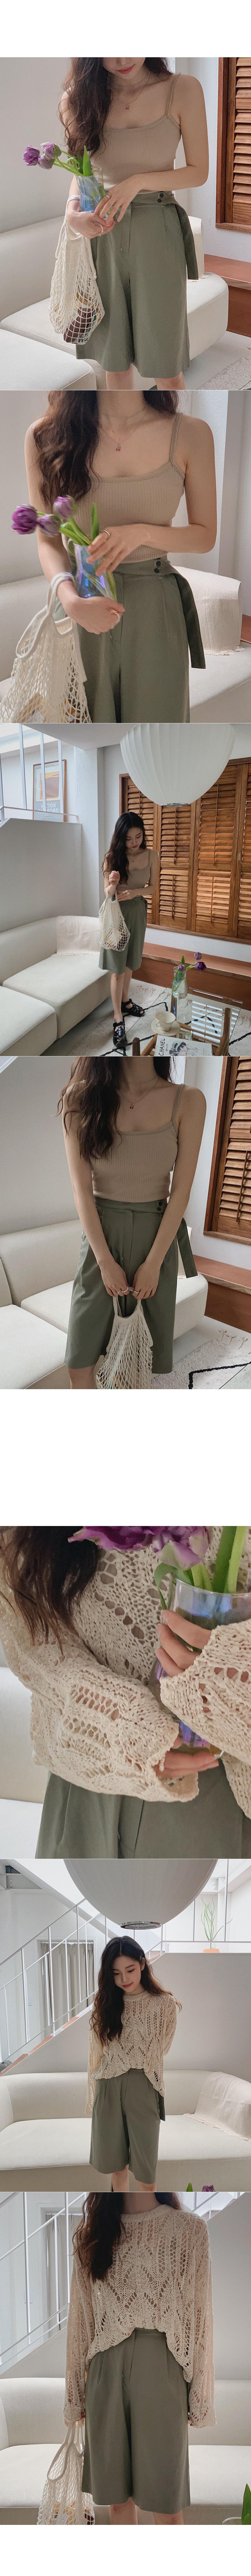 Preview bermuda trousers